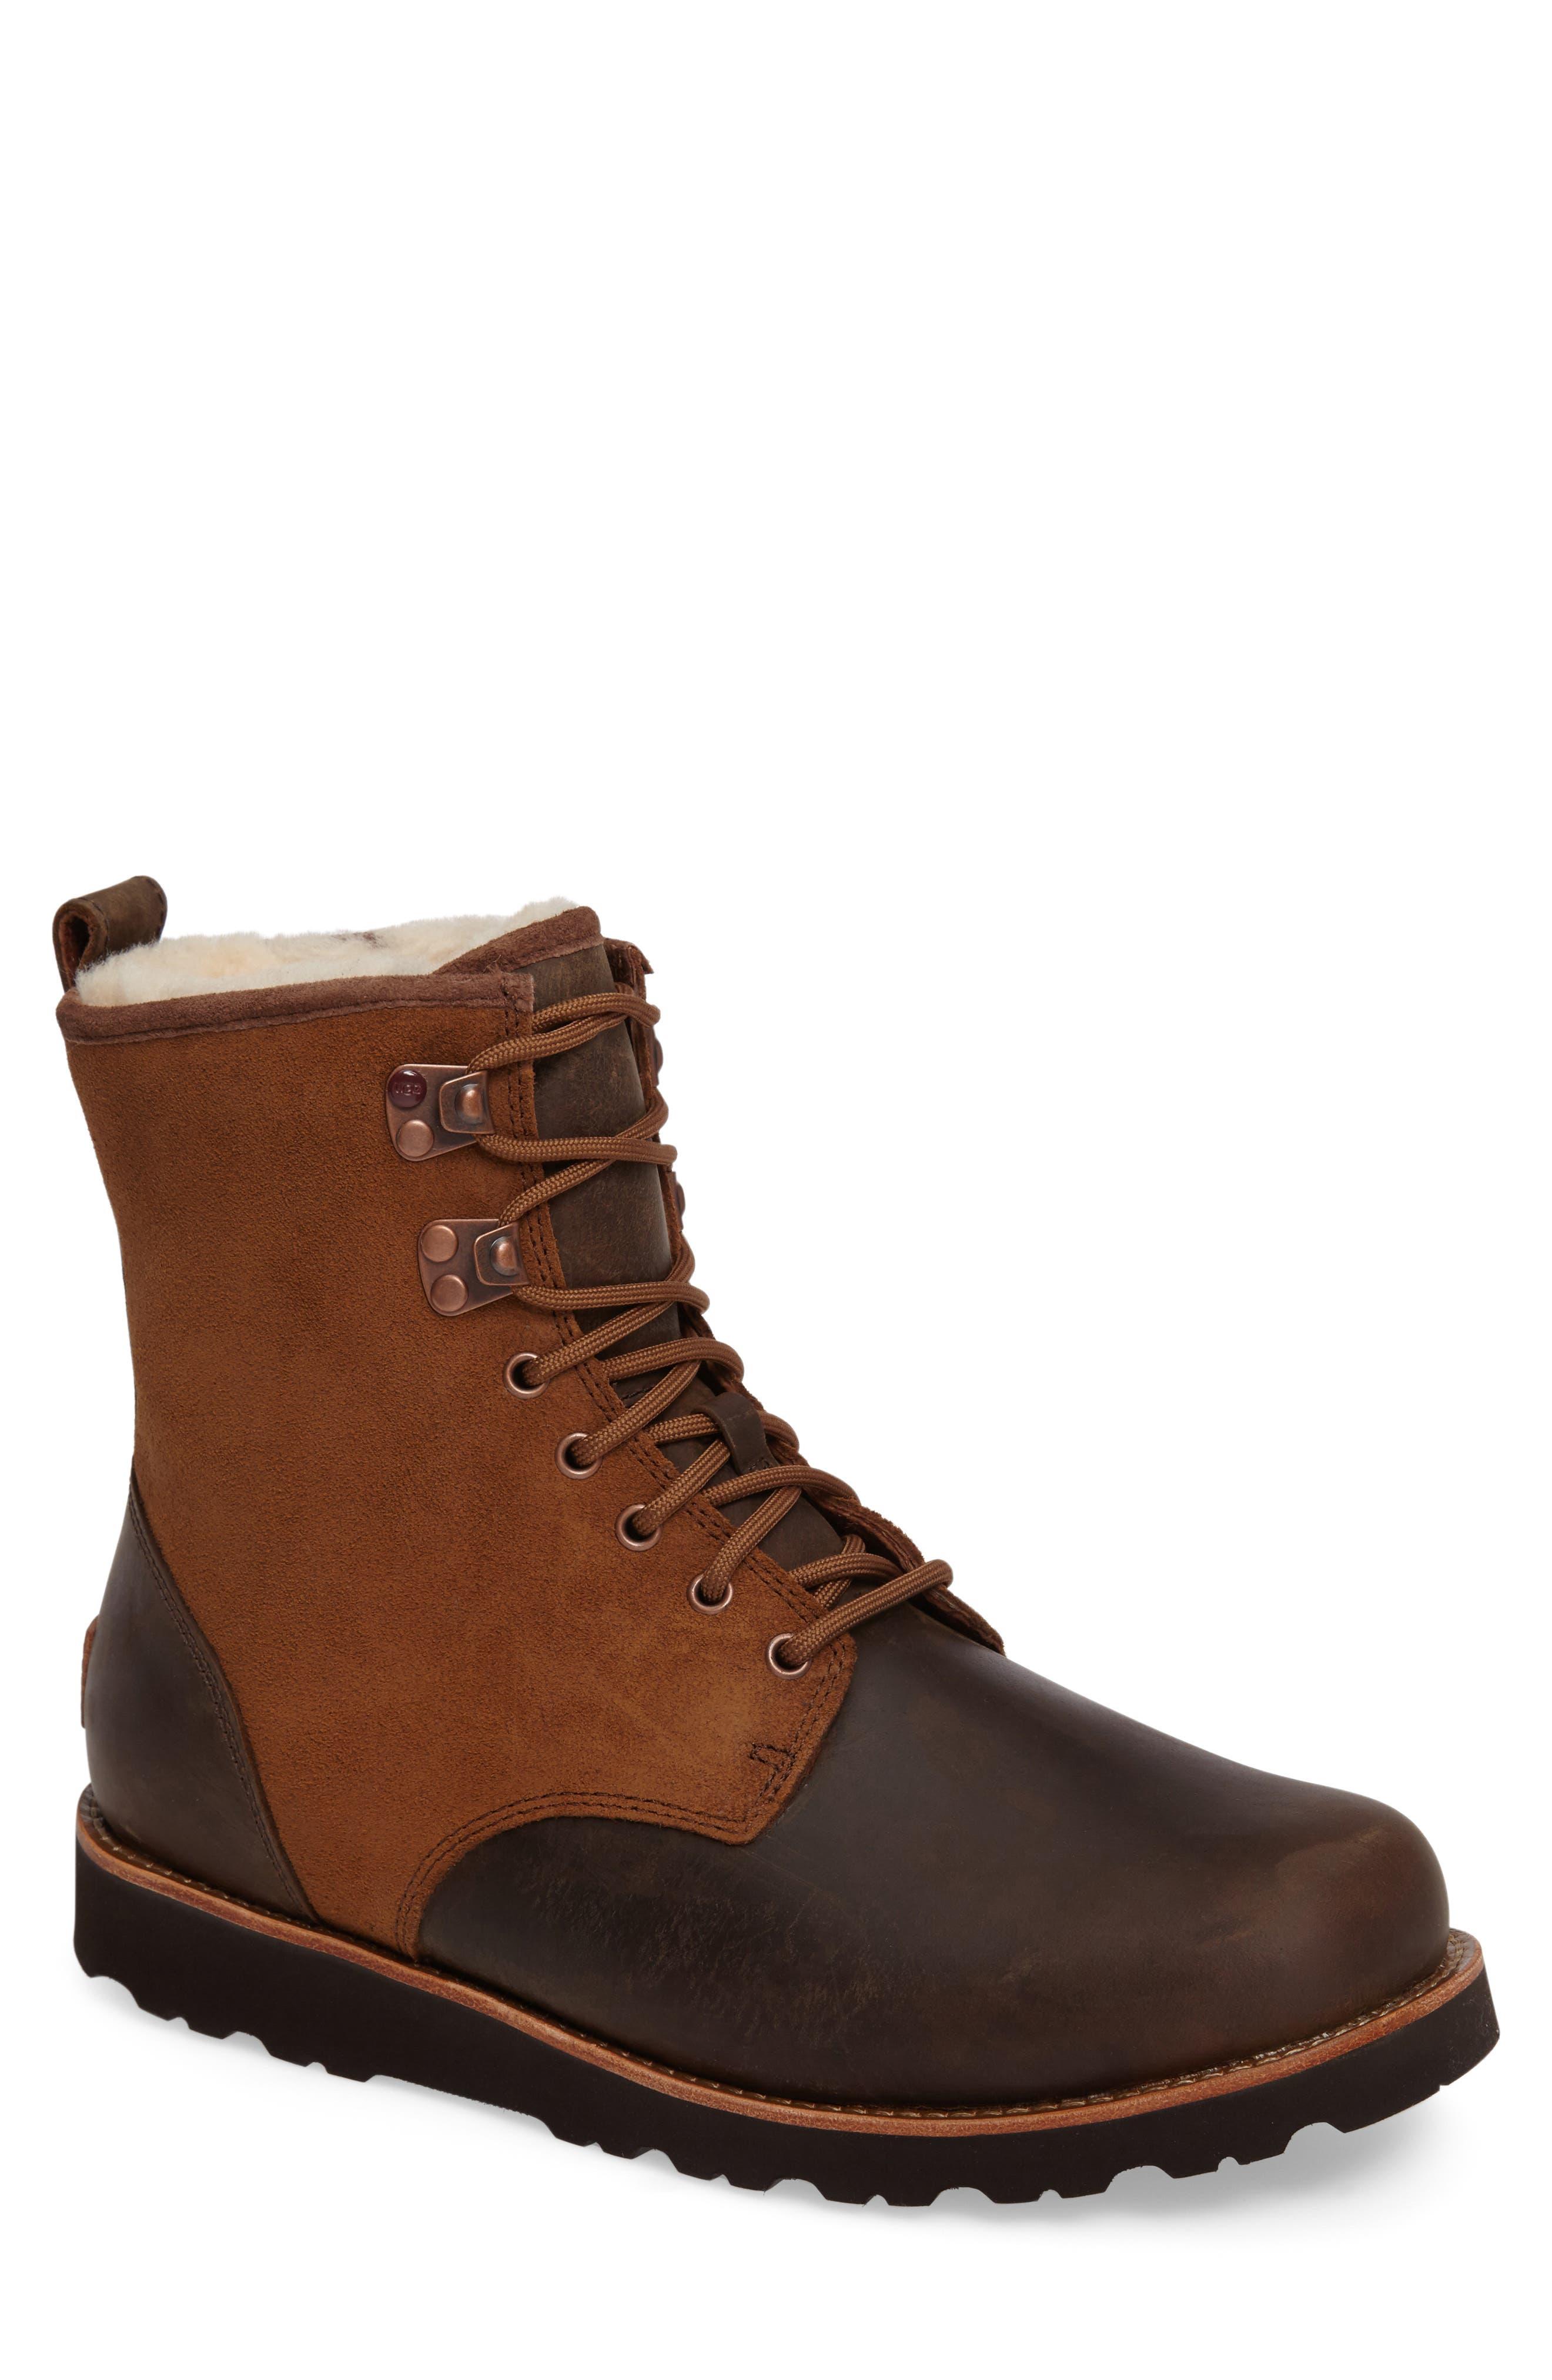 Alternate Image 1 Selected - UGG® Hannen Plain Toe Waterproof Boot with Genuine Shearling (Men)